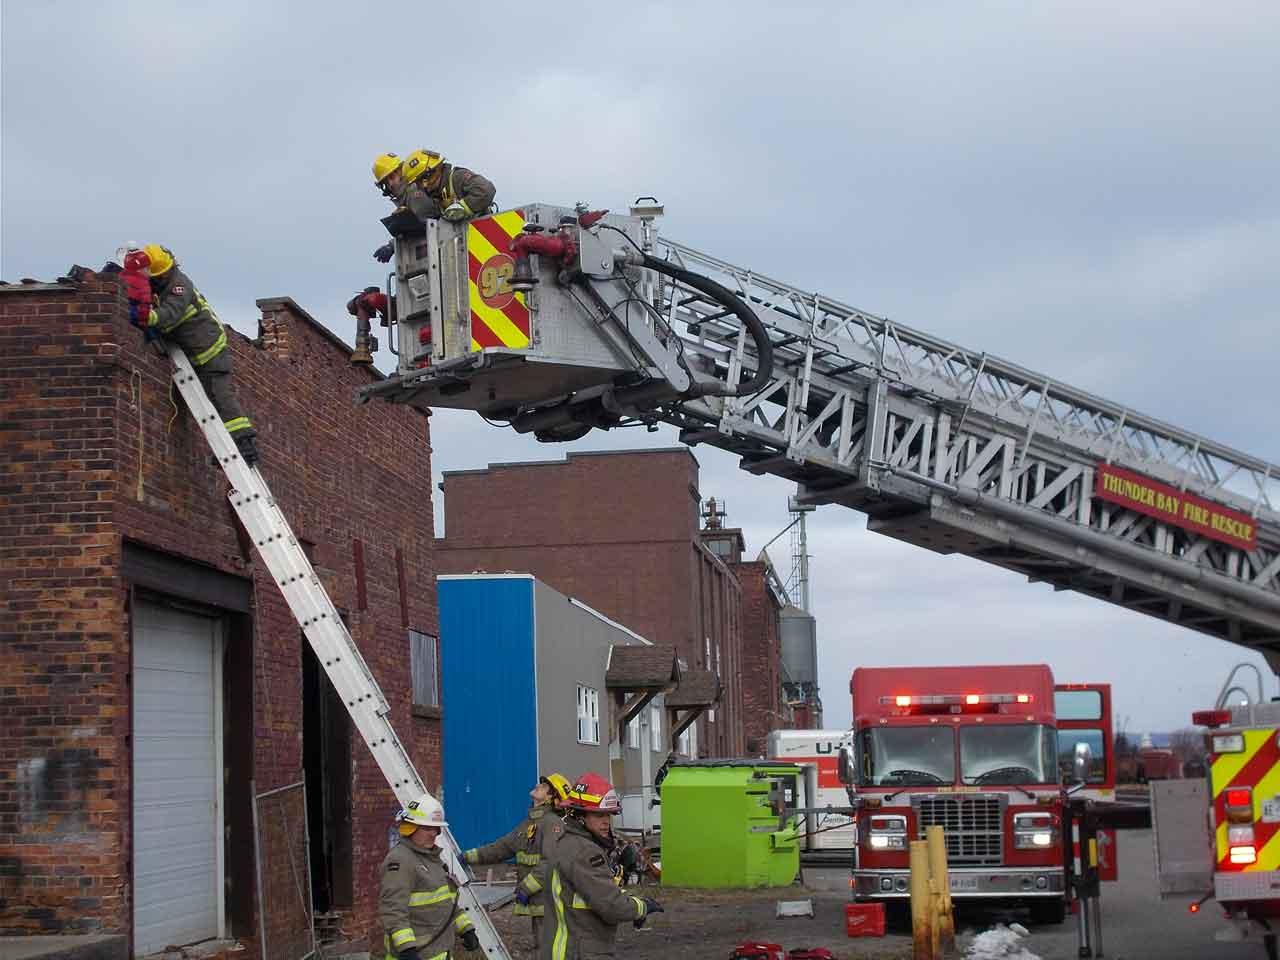 Thunder Bay Fire Rescue on Hardisty Street